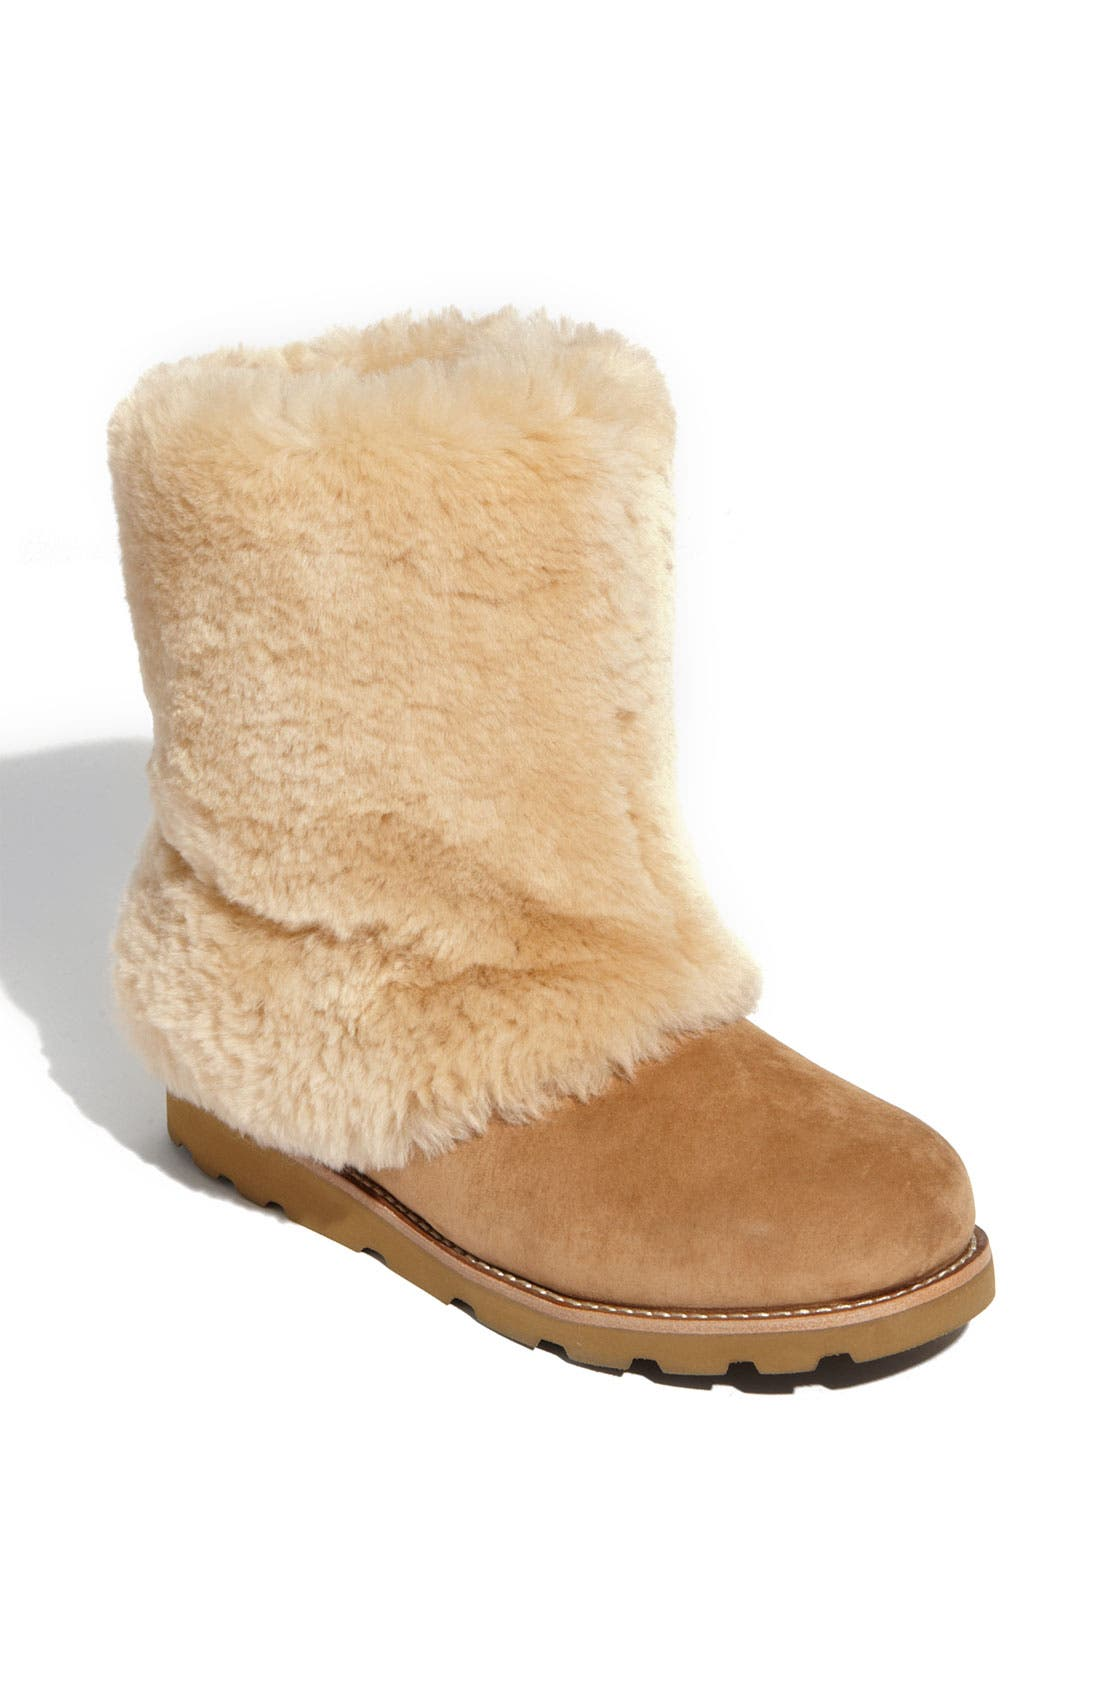 Alternate Image 1 Selected - UGG® Australia 'Maylin' Boot